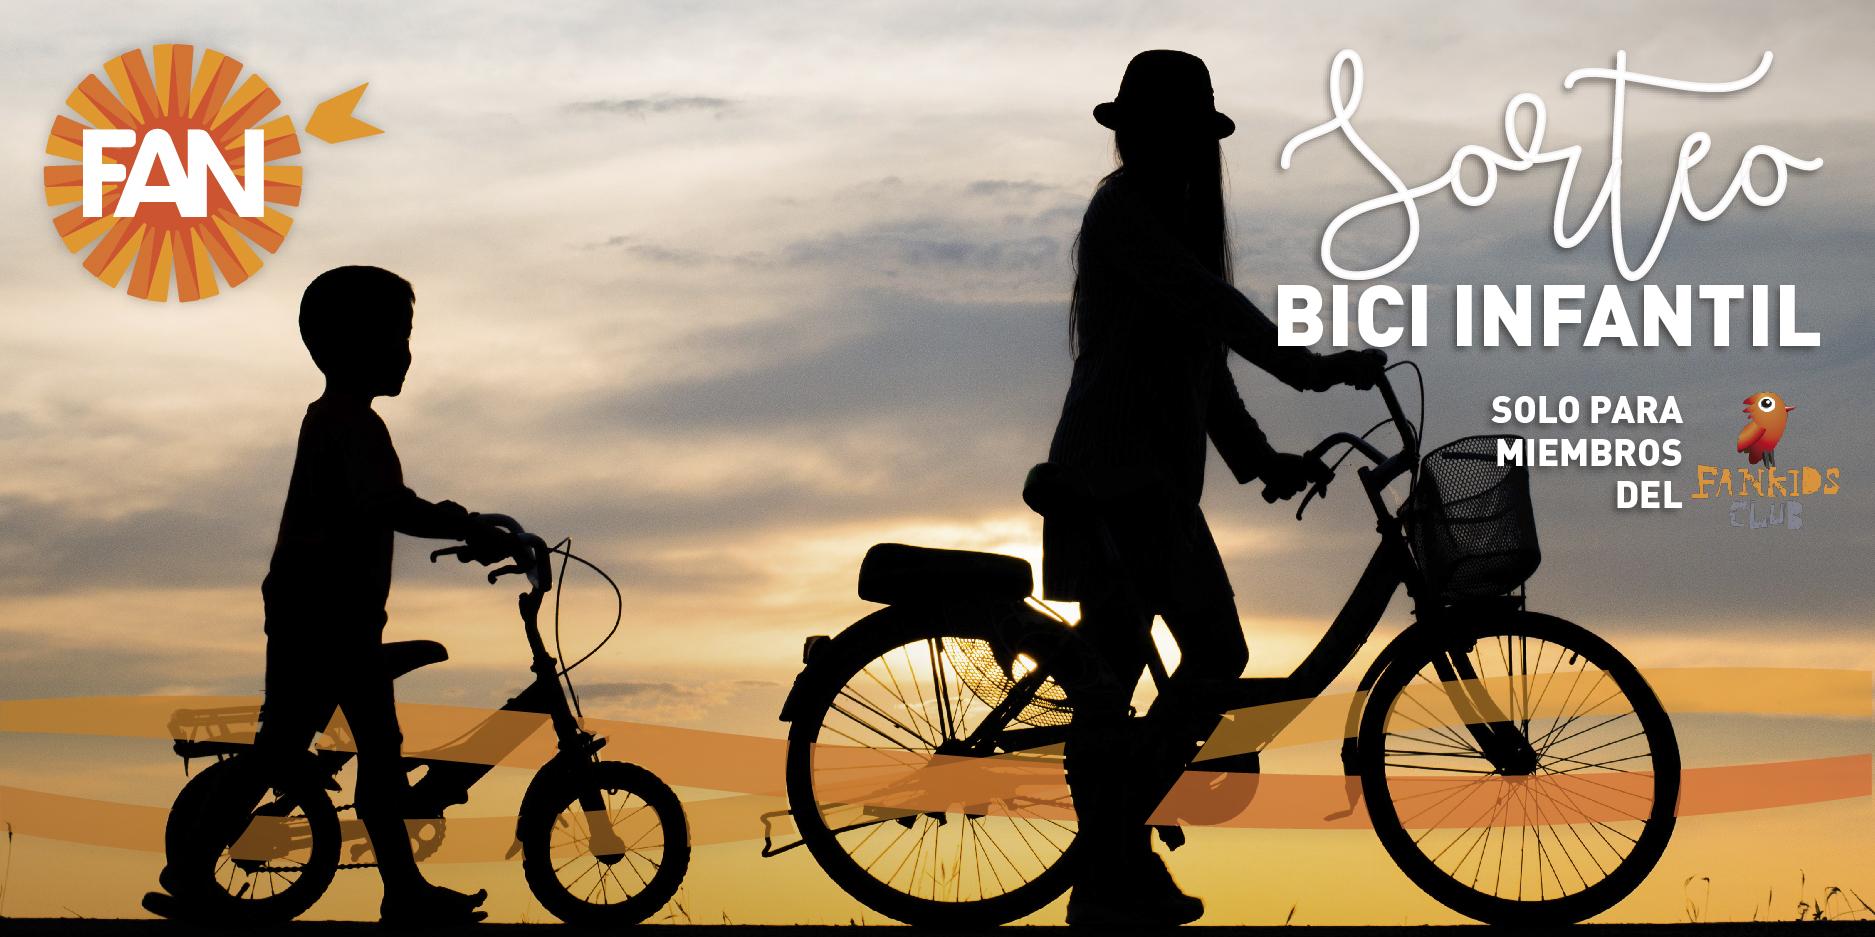 FAN_Concurso Bici Infantil_Destacada agenda